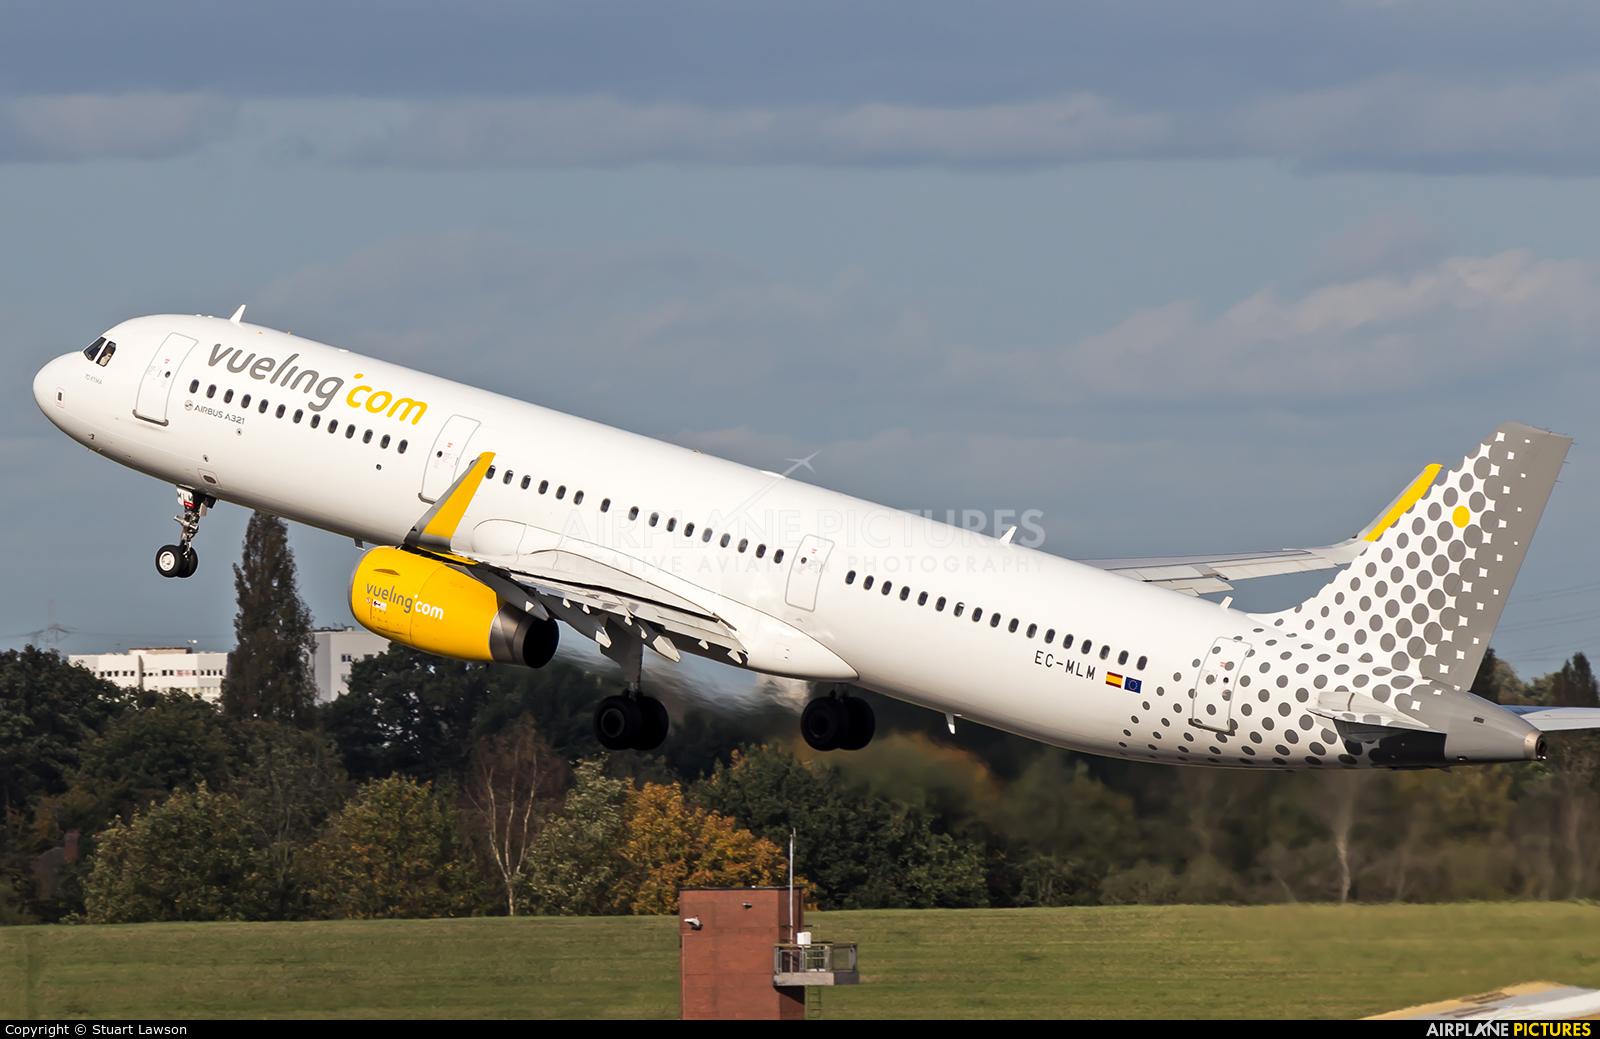 Vueling Airlines EC-MLM aircraft at Birmingham